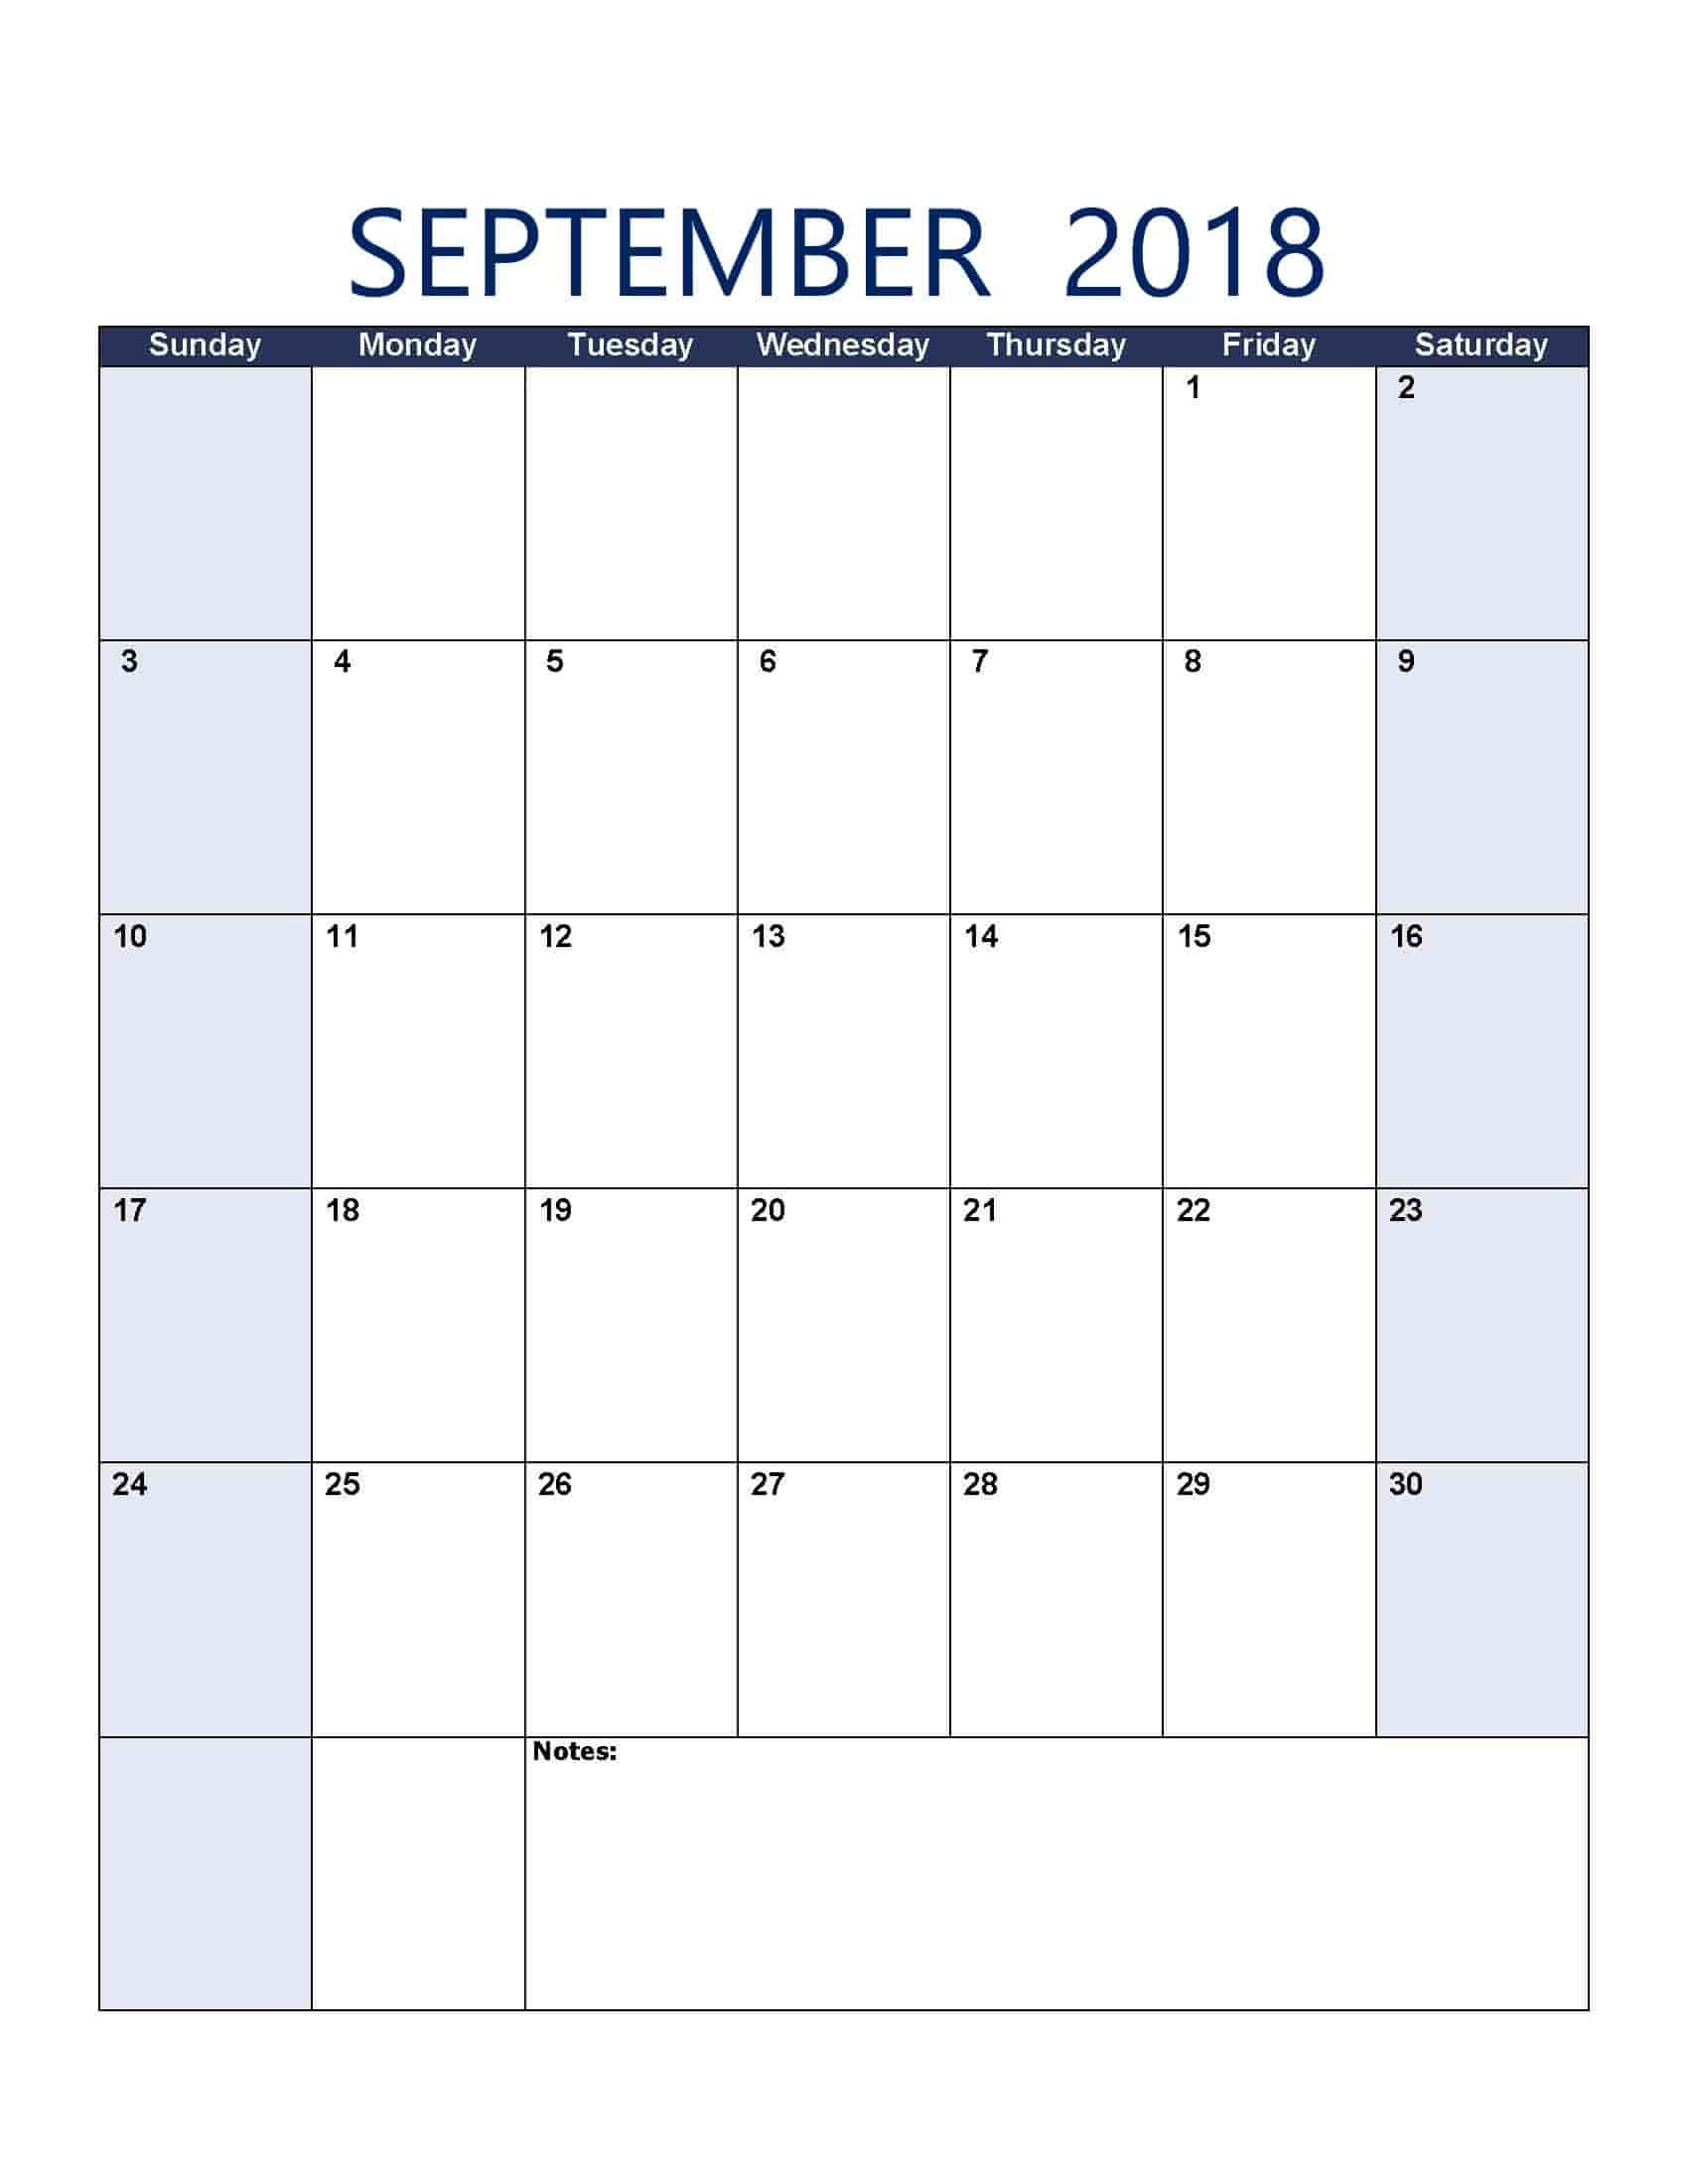 September 2018 Calendar - Free, Printable Calendar Templates for Free Printable September Blank Calendars With Christian Themes